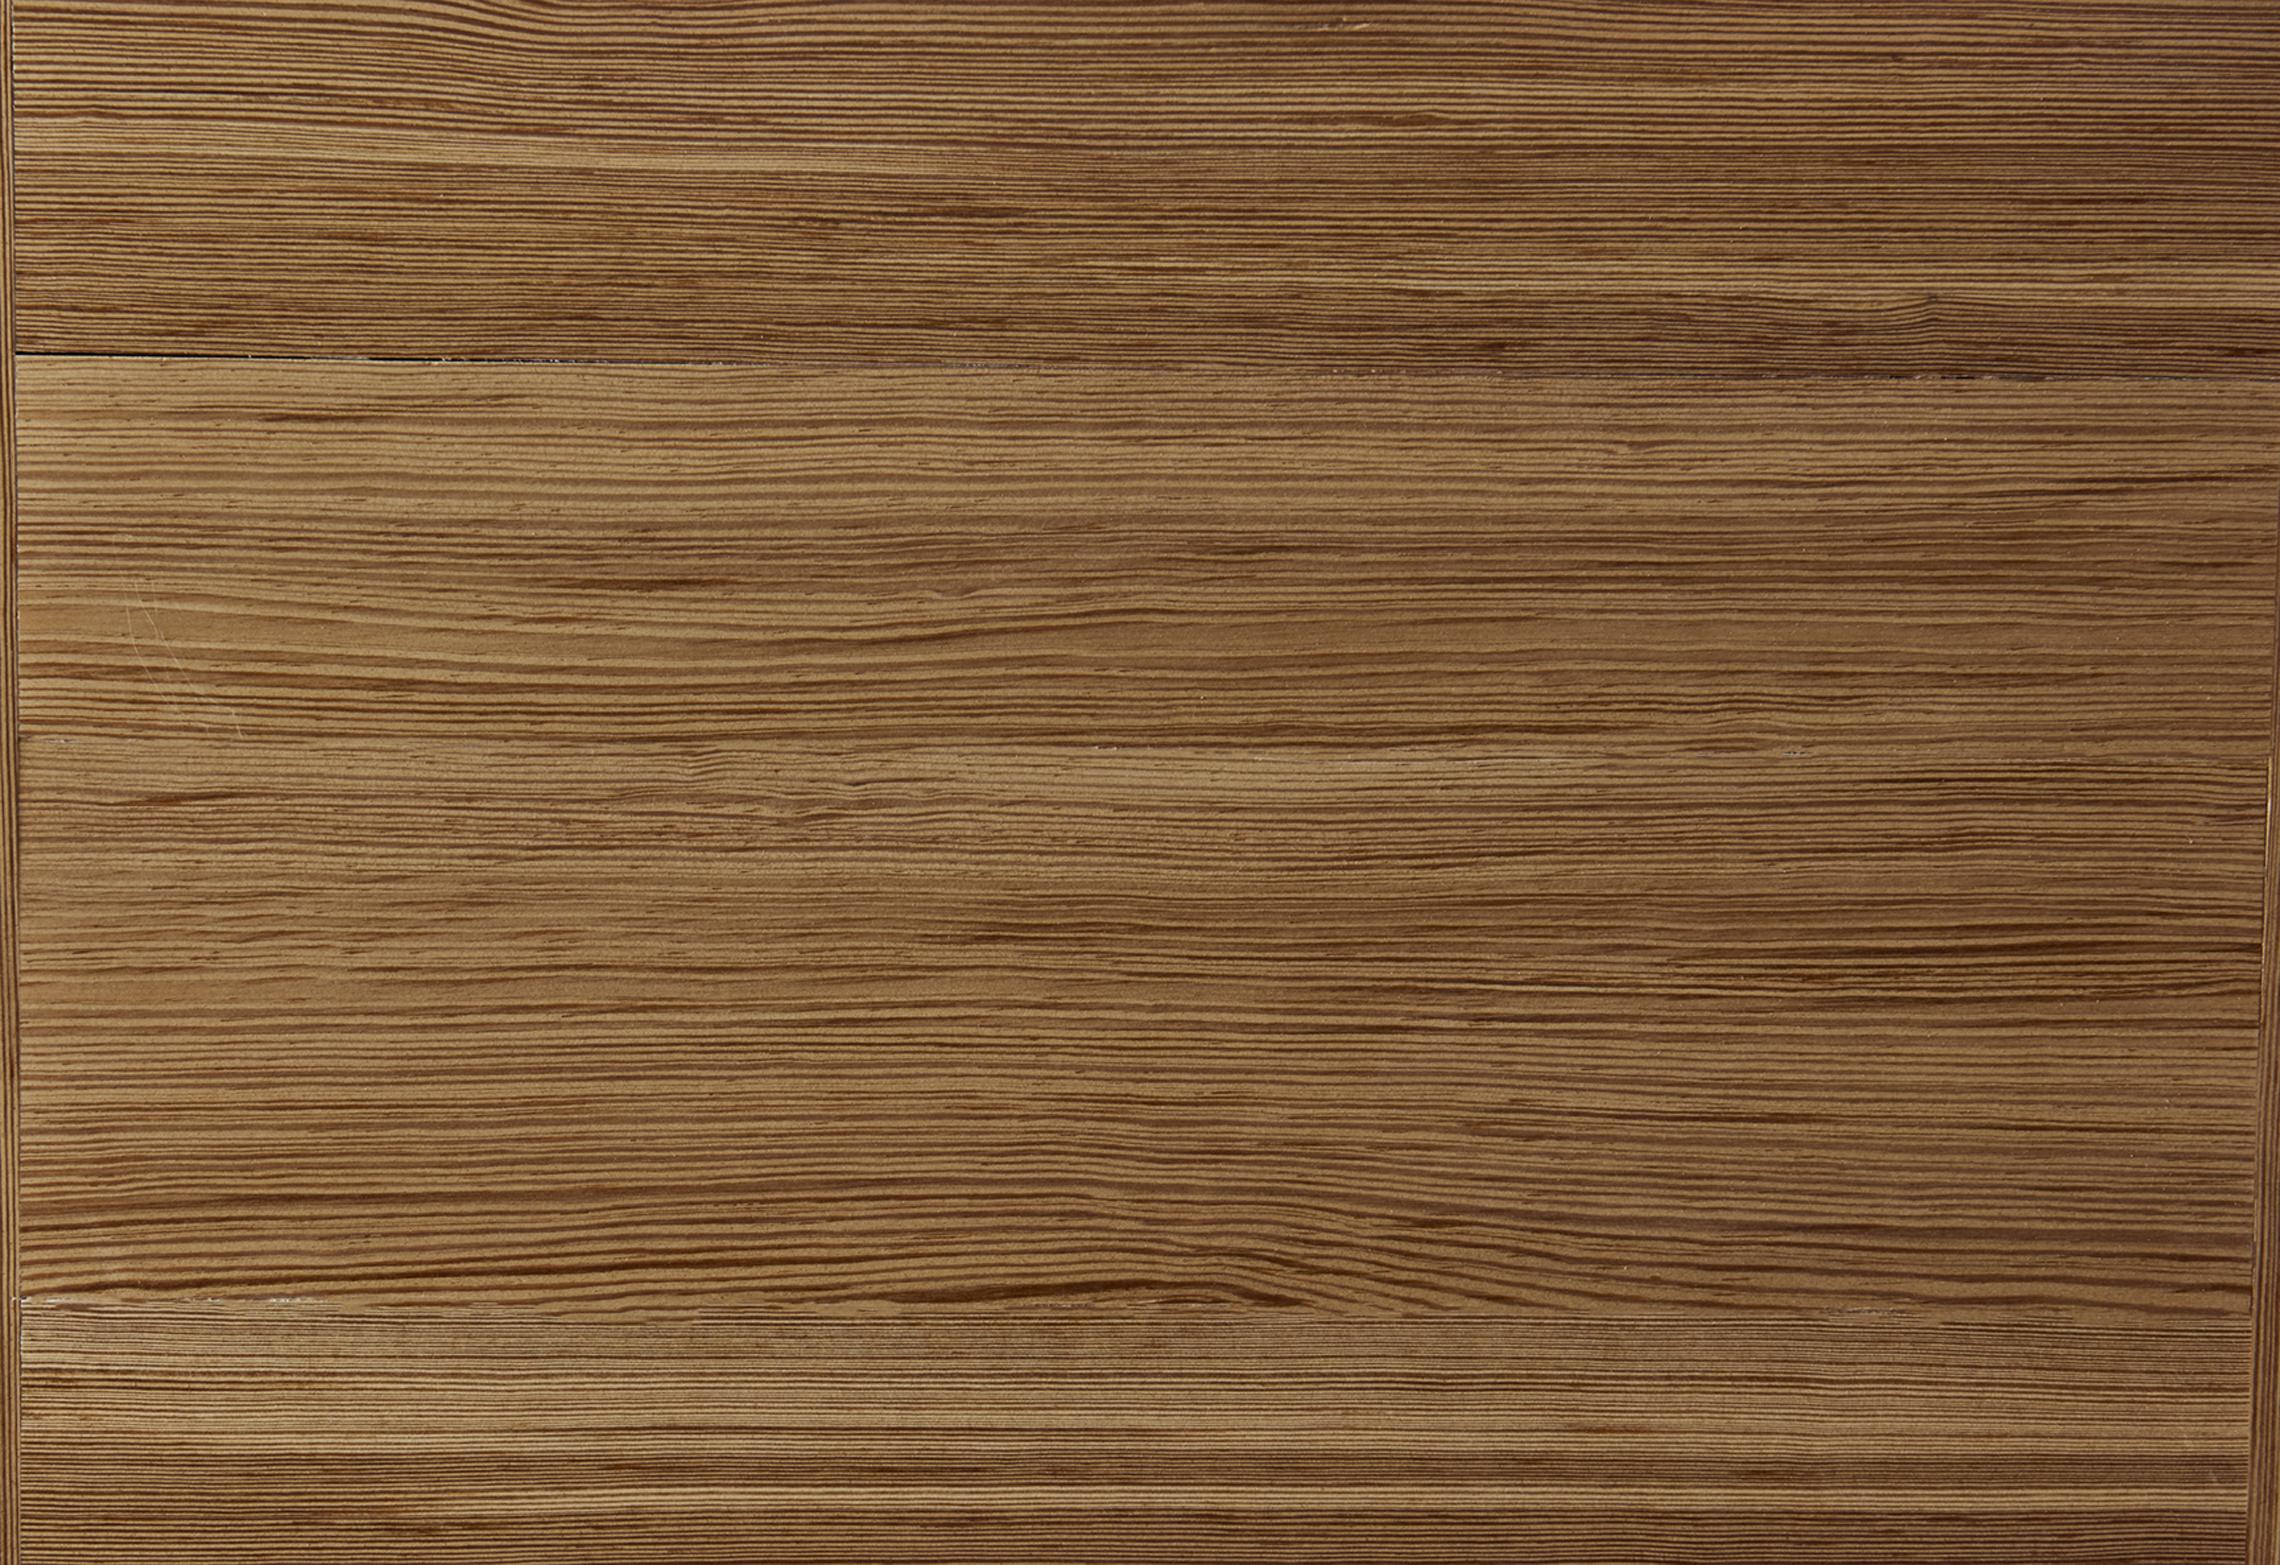 Longleaf pine flooring NYC